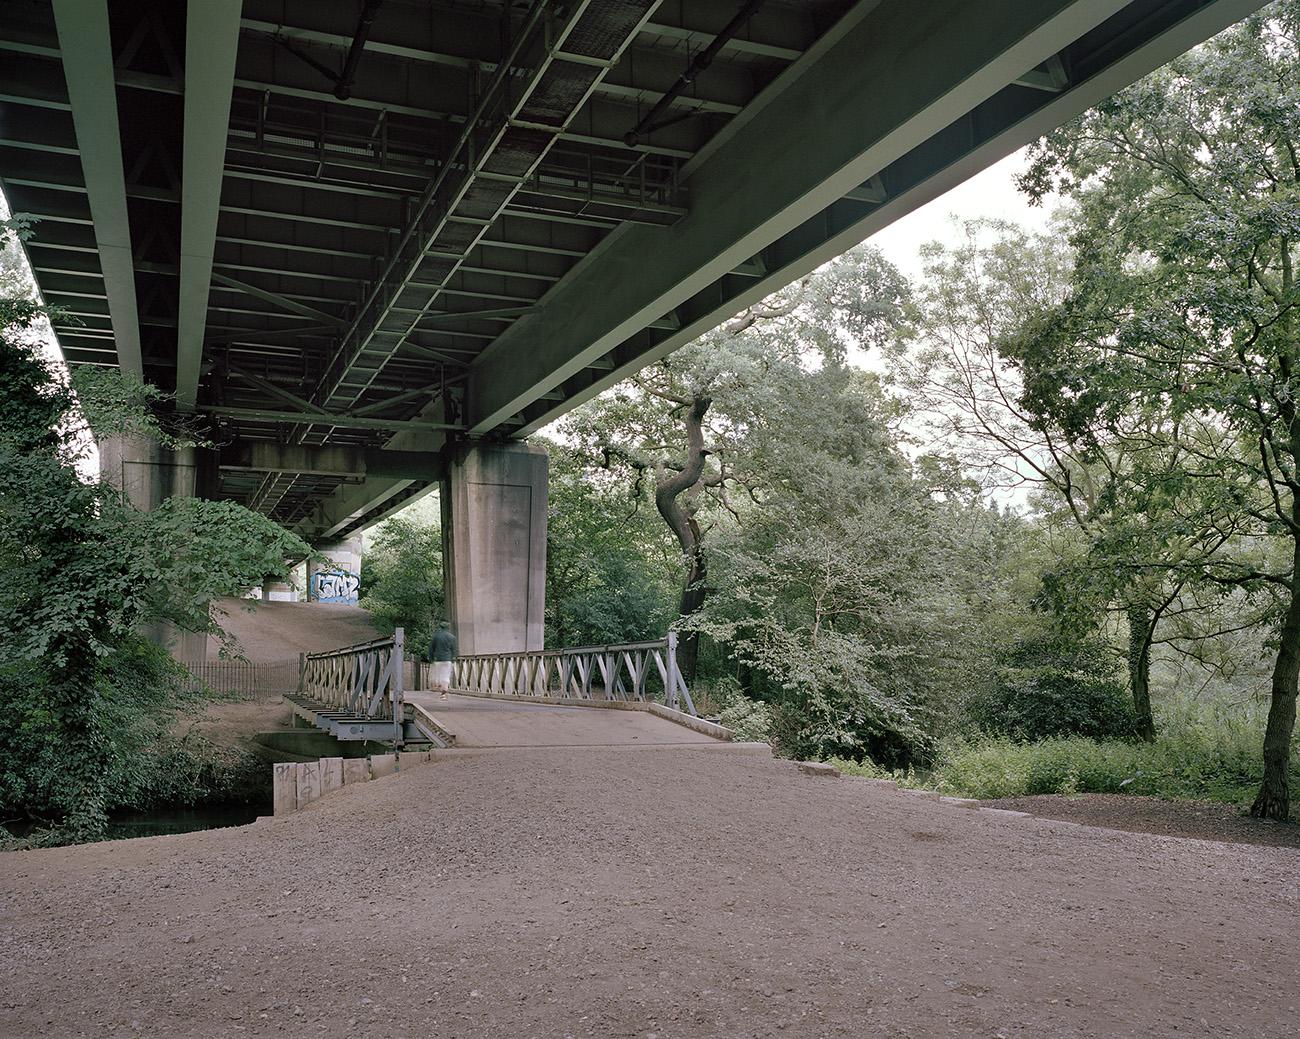 Few outside of the neighbourhood know of the walkway's existence, lending it a 'secret' status